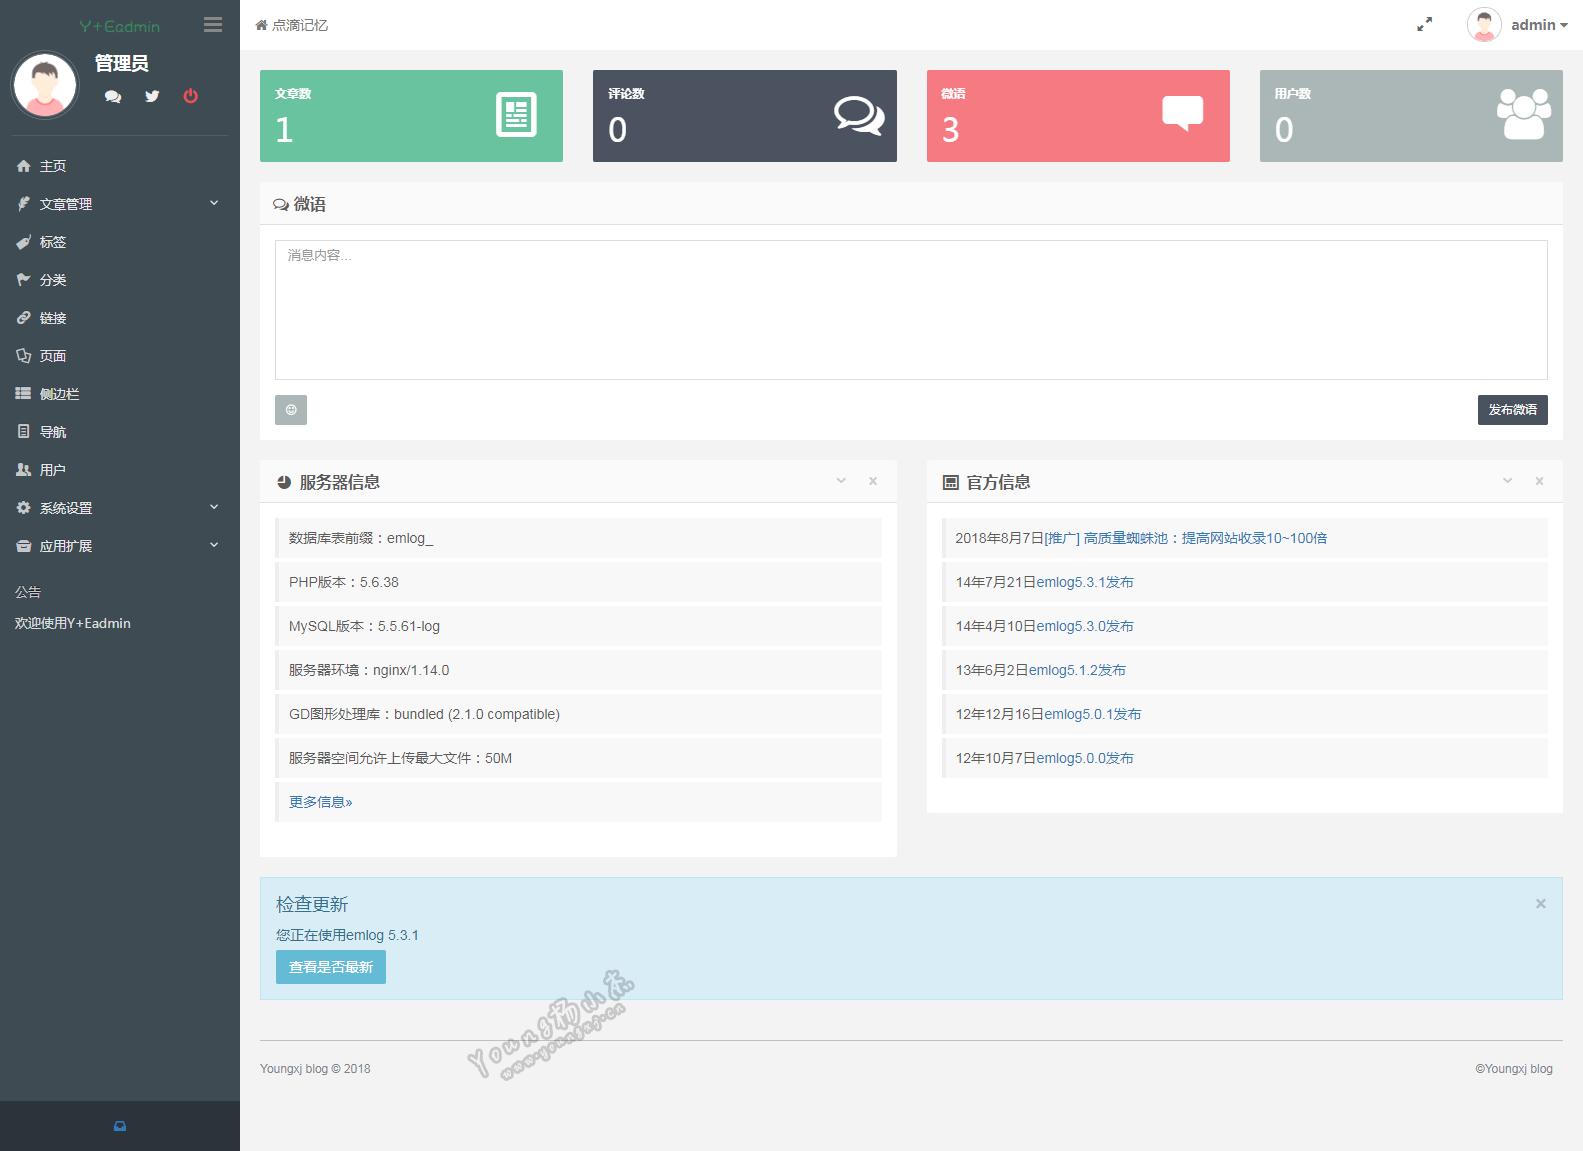 【emlog模板】Emlog后台模版Y+Eadmin支持5.3.1和6.0.0版本